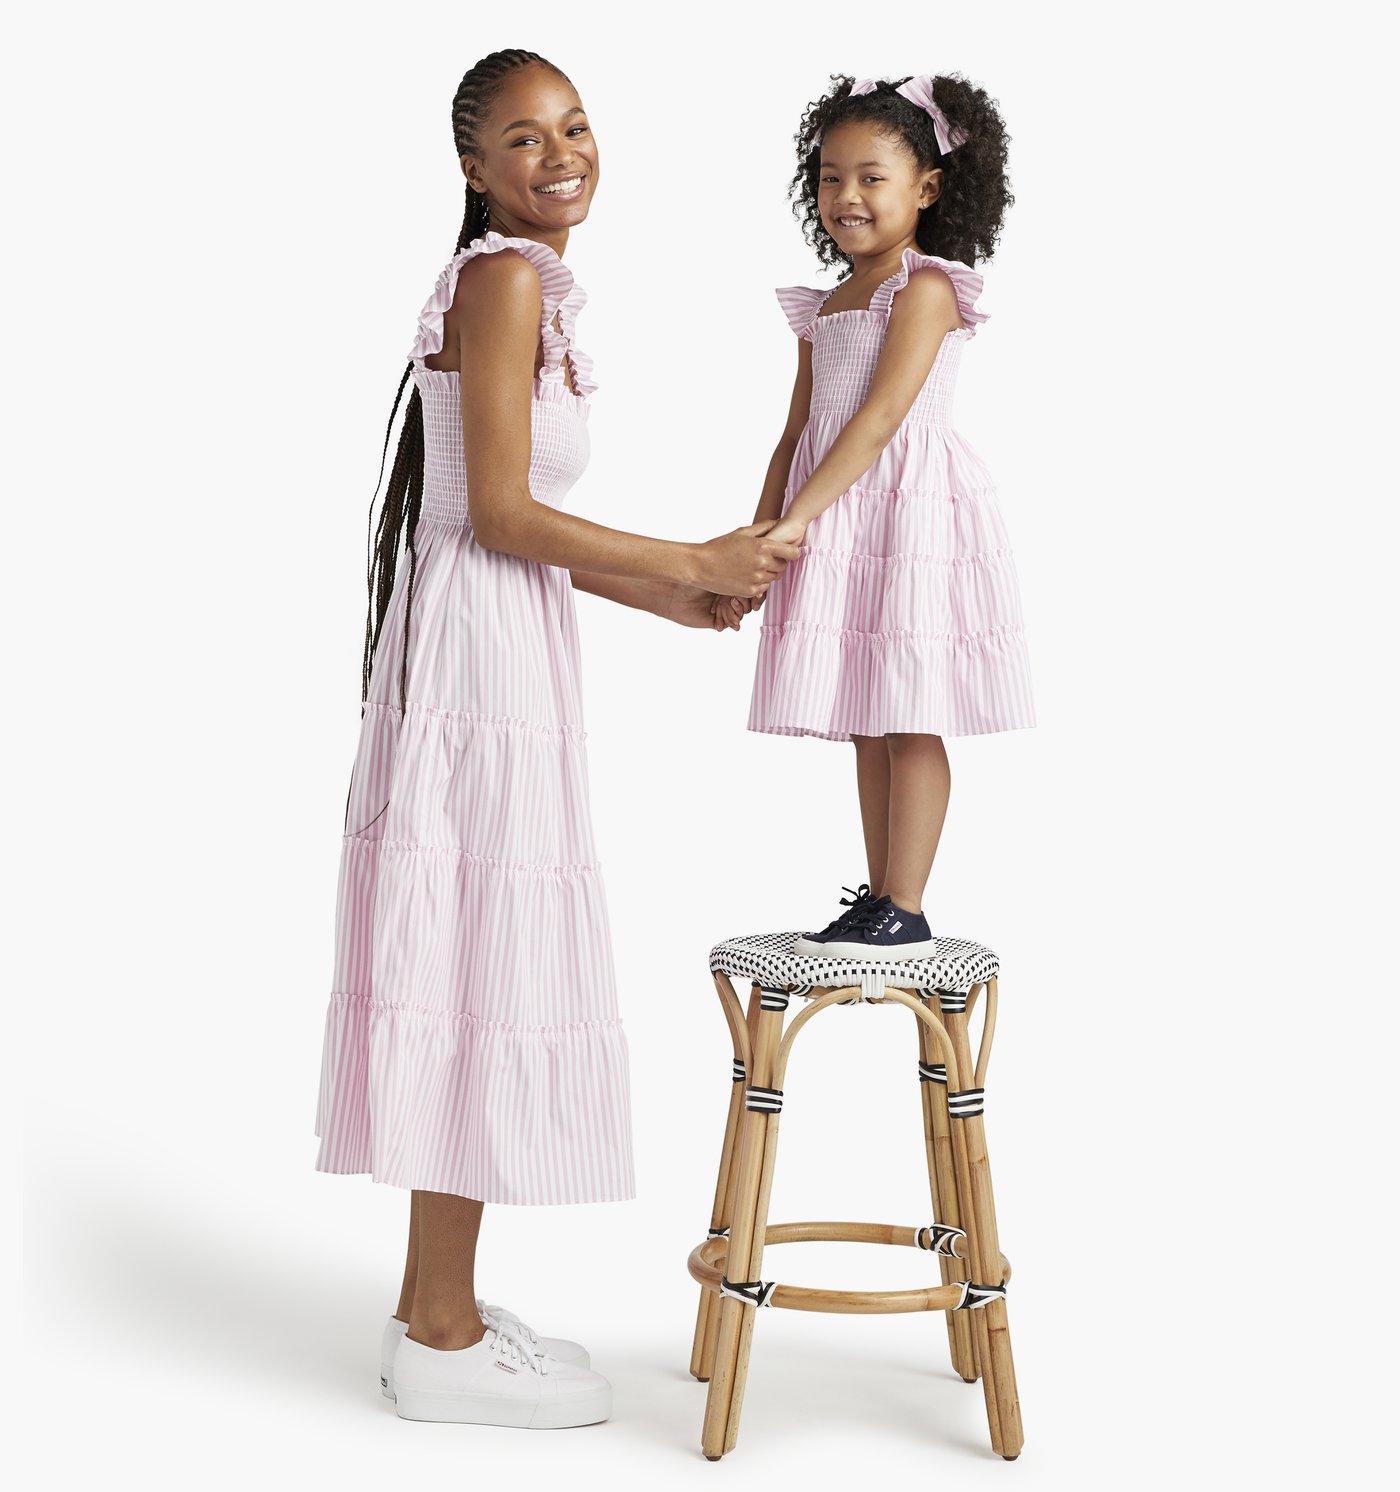 Hill House New Arrivals for Women + Little Girls